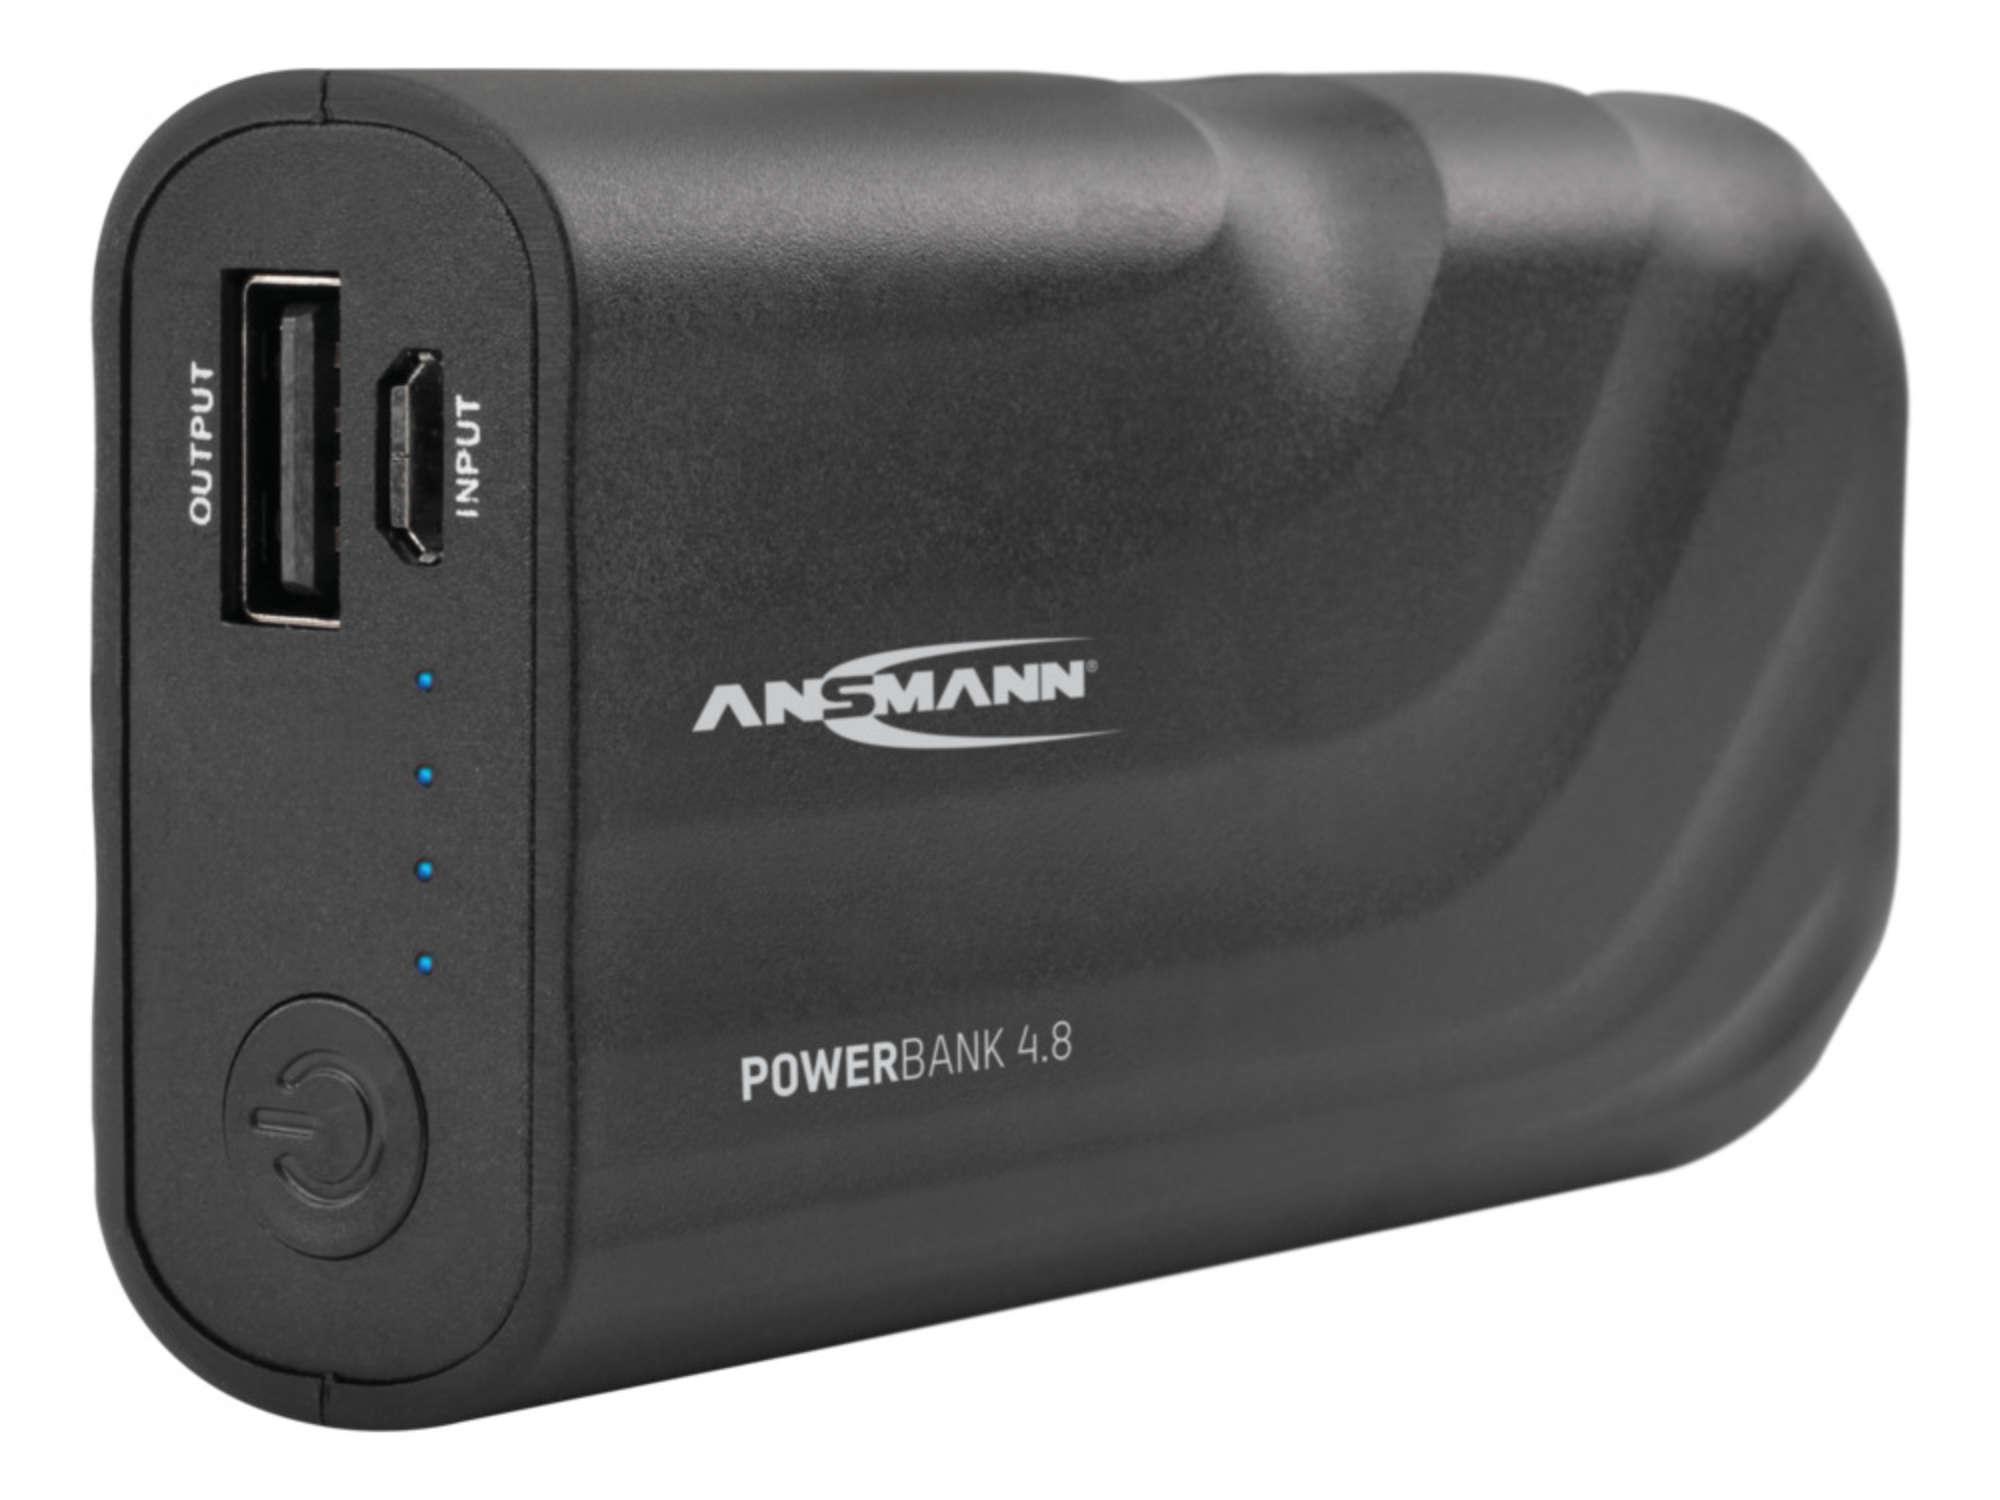 Powerbank 4.8